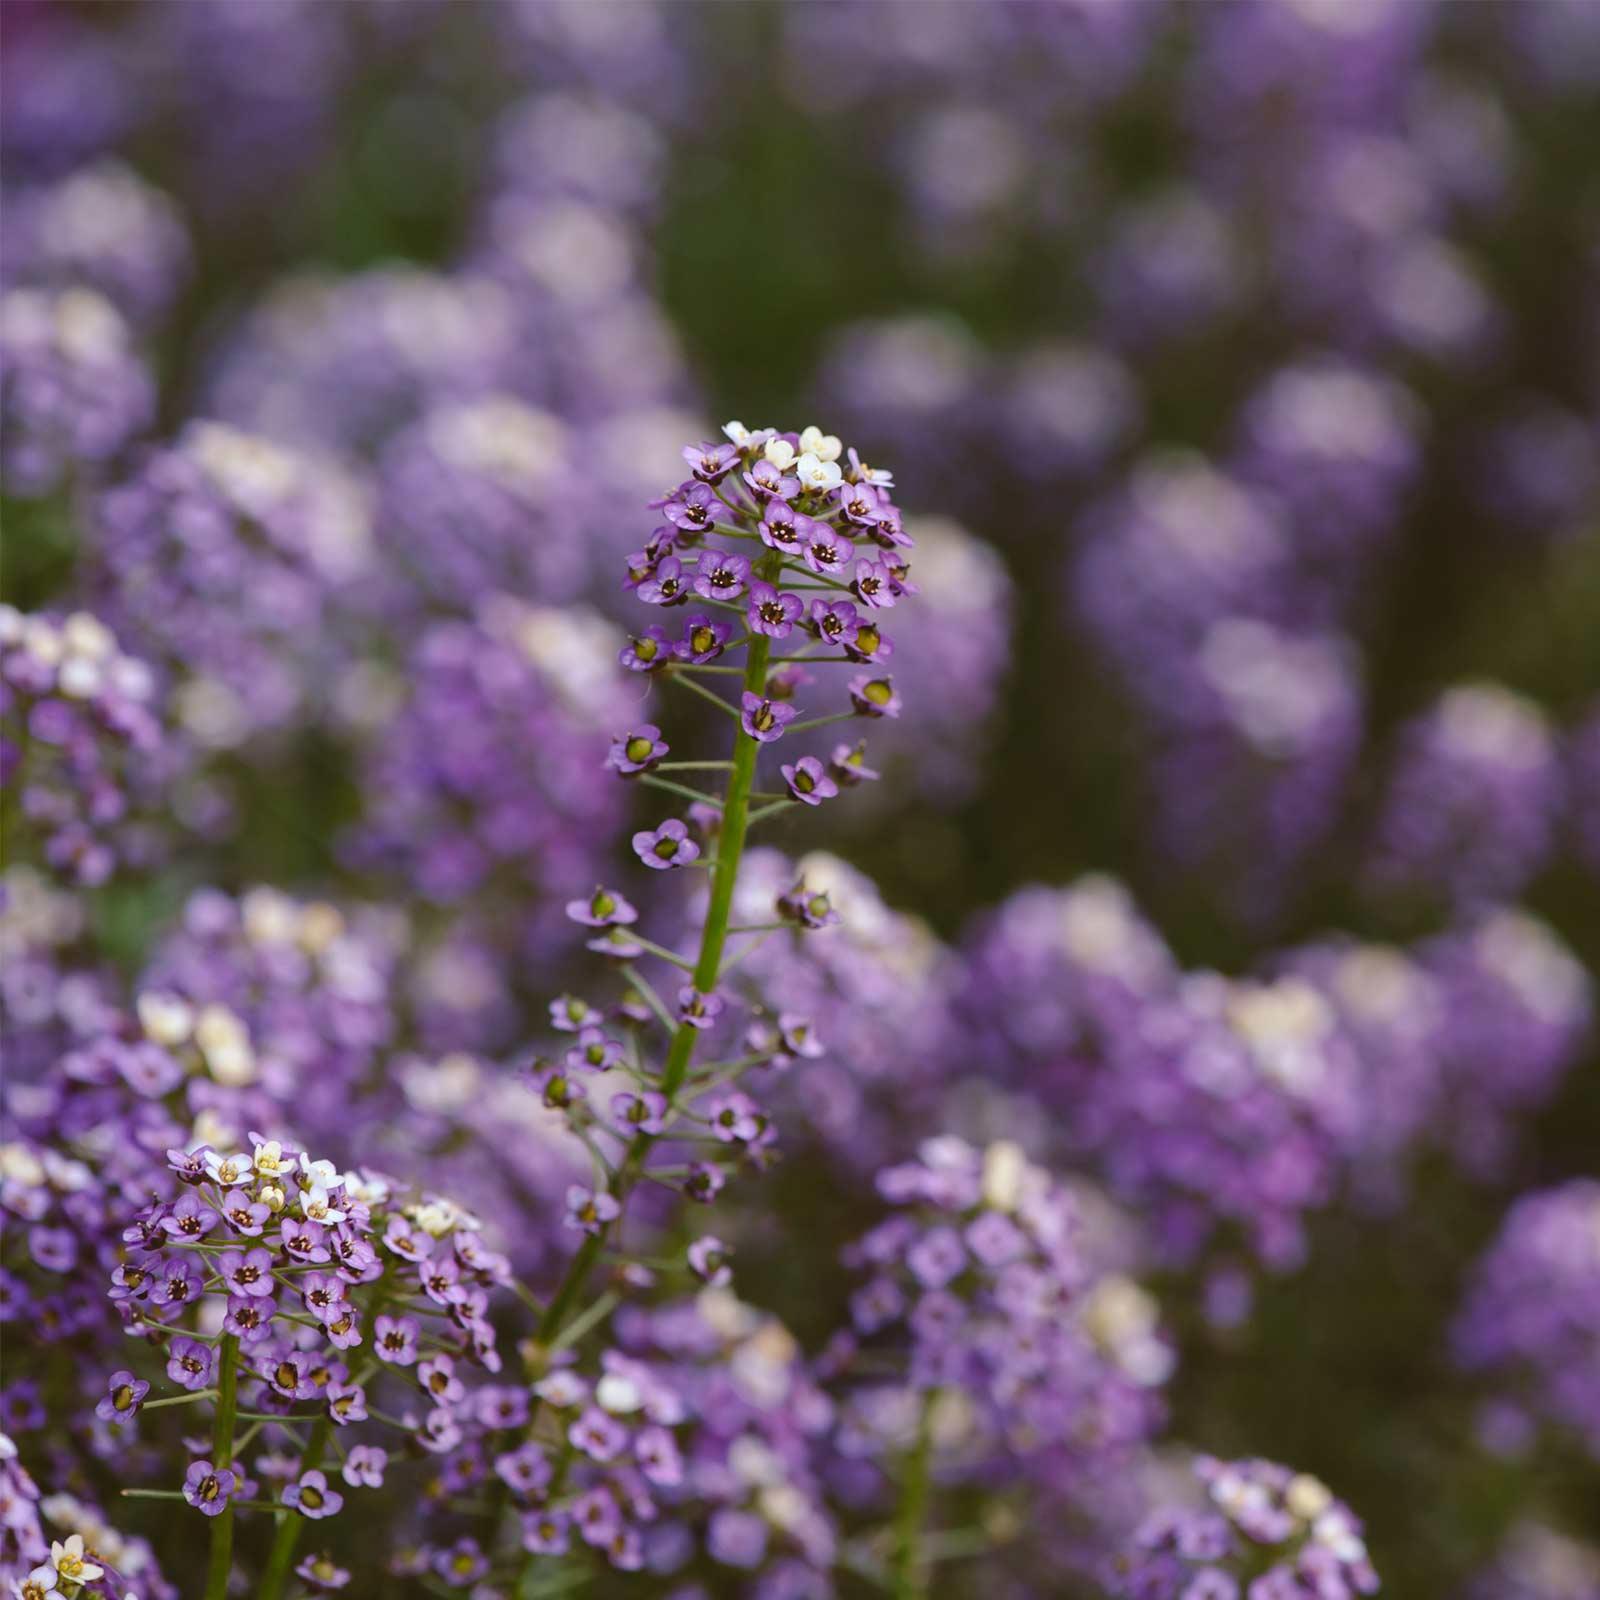 Alyssum Wonderland Series Flower Garden Seeds: Blue - Approx 5000 Seeds - Annual - Lobularia maritima